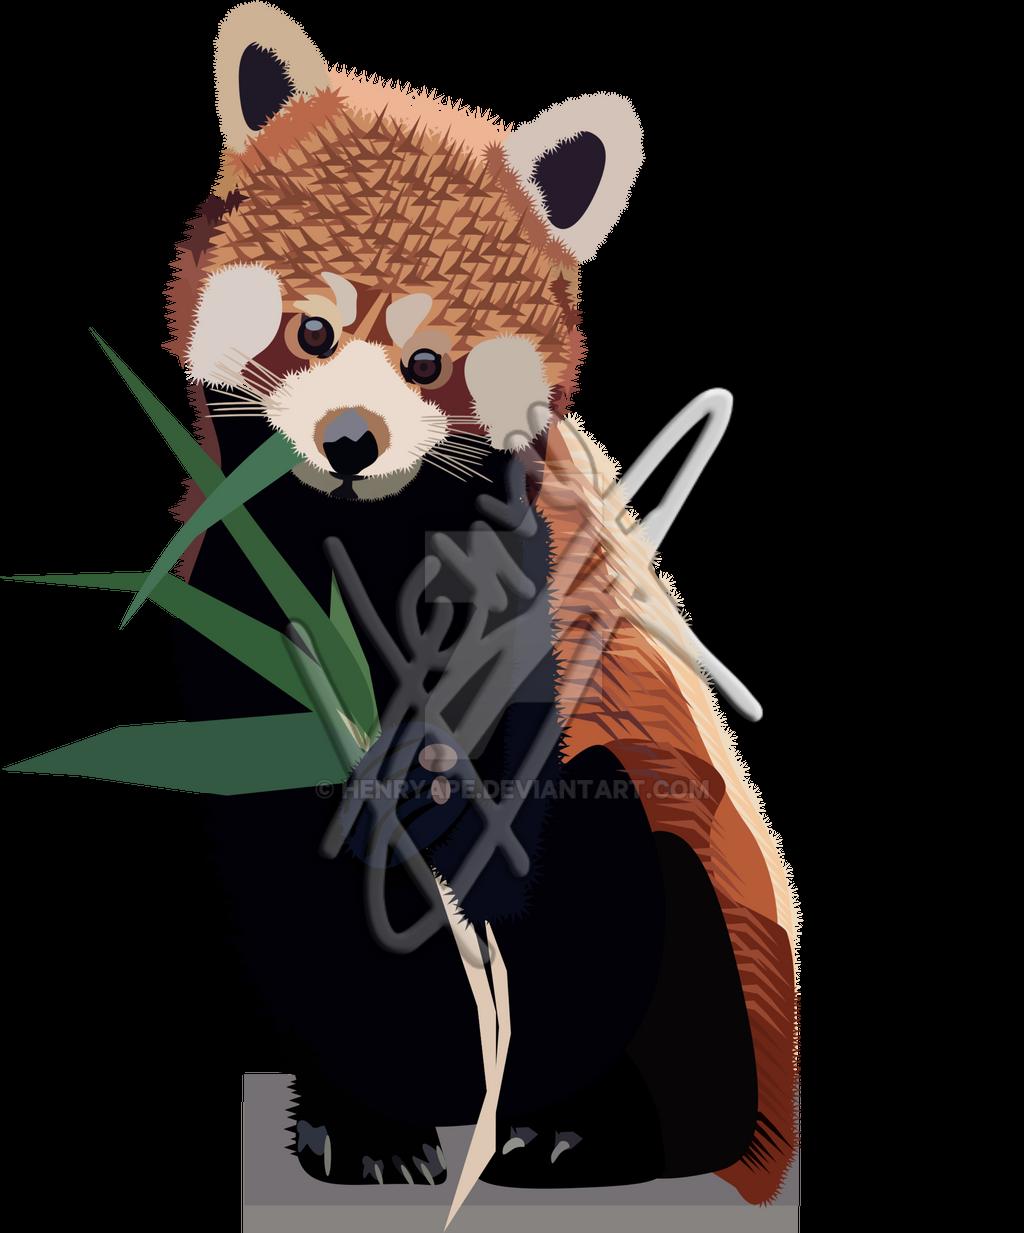 Realistic Illustration Red Panda By Henryape On Deviantart